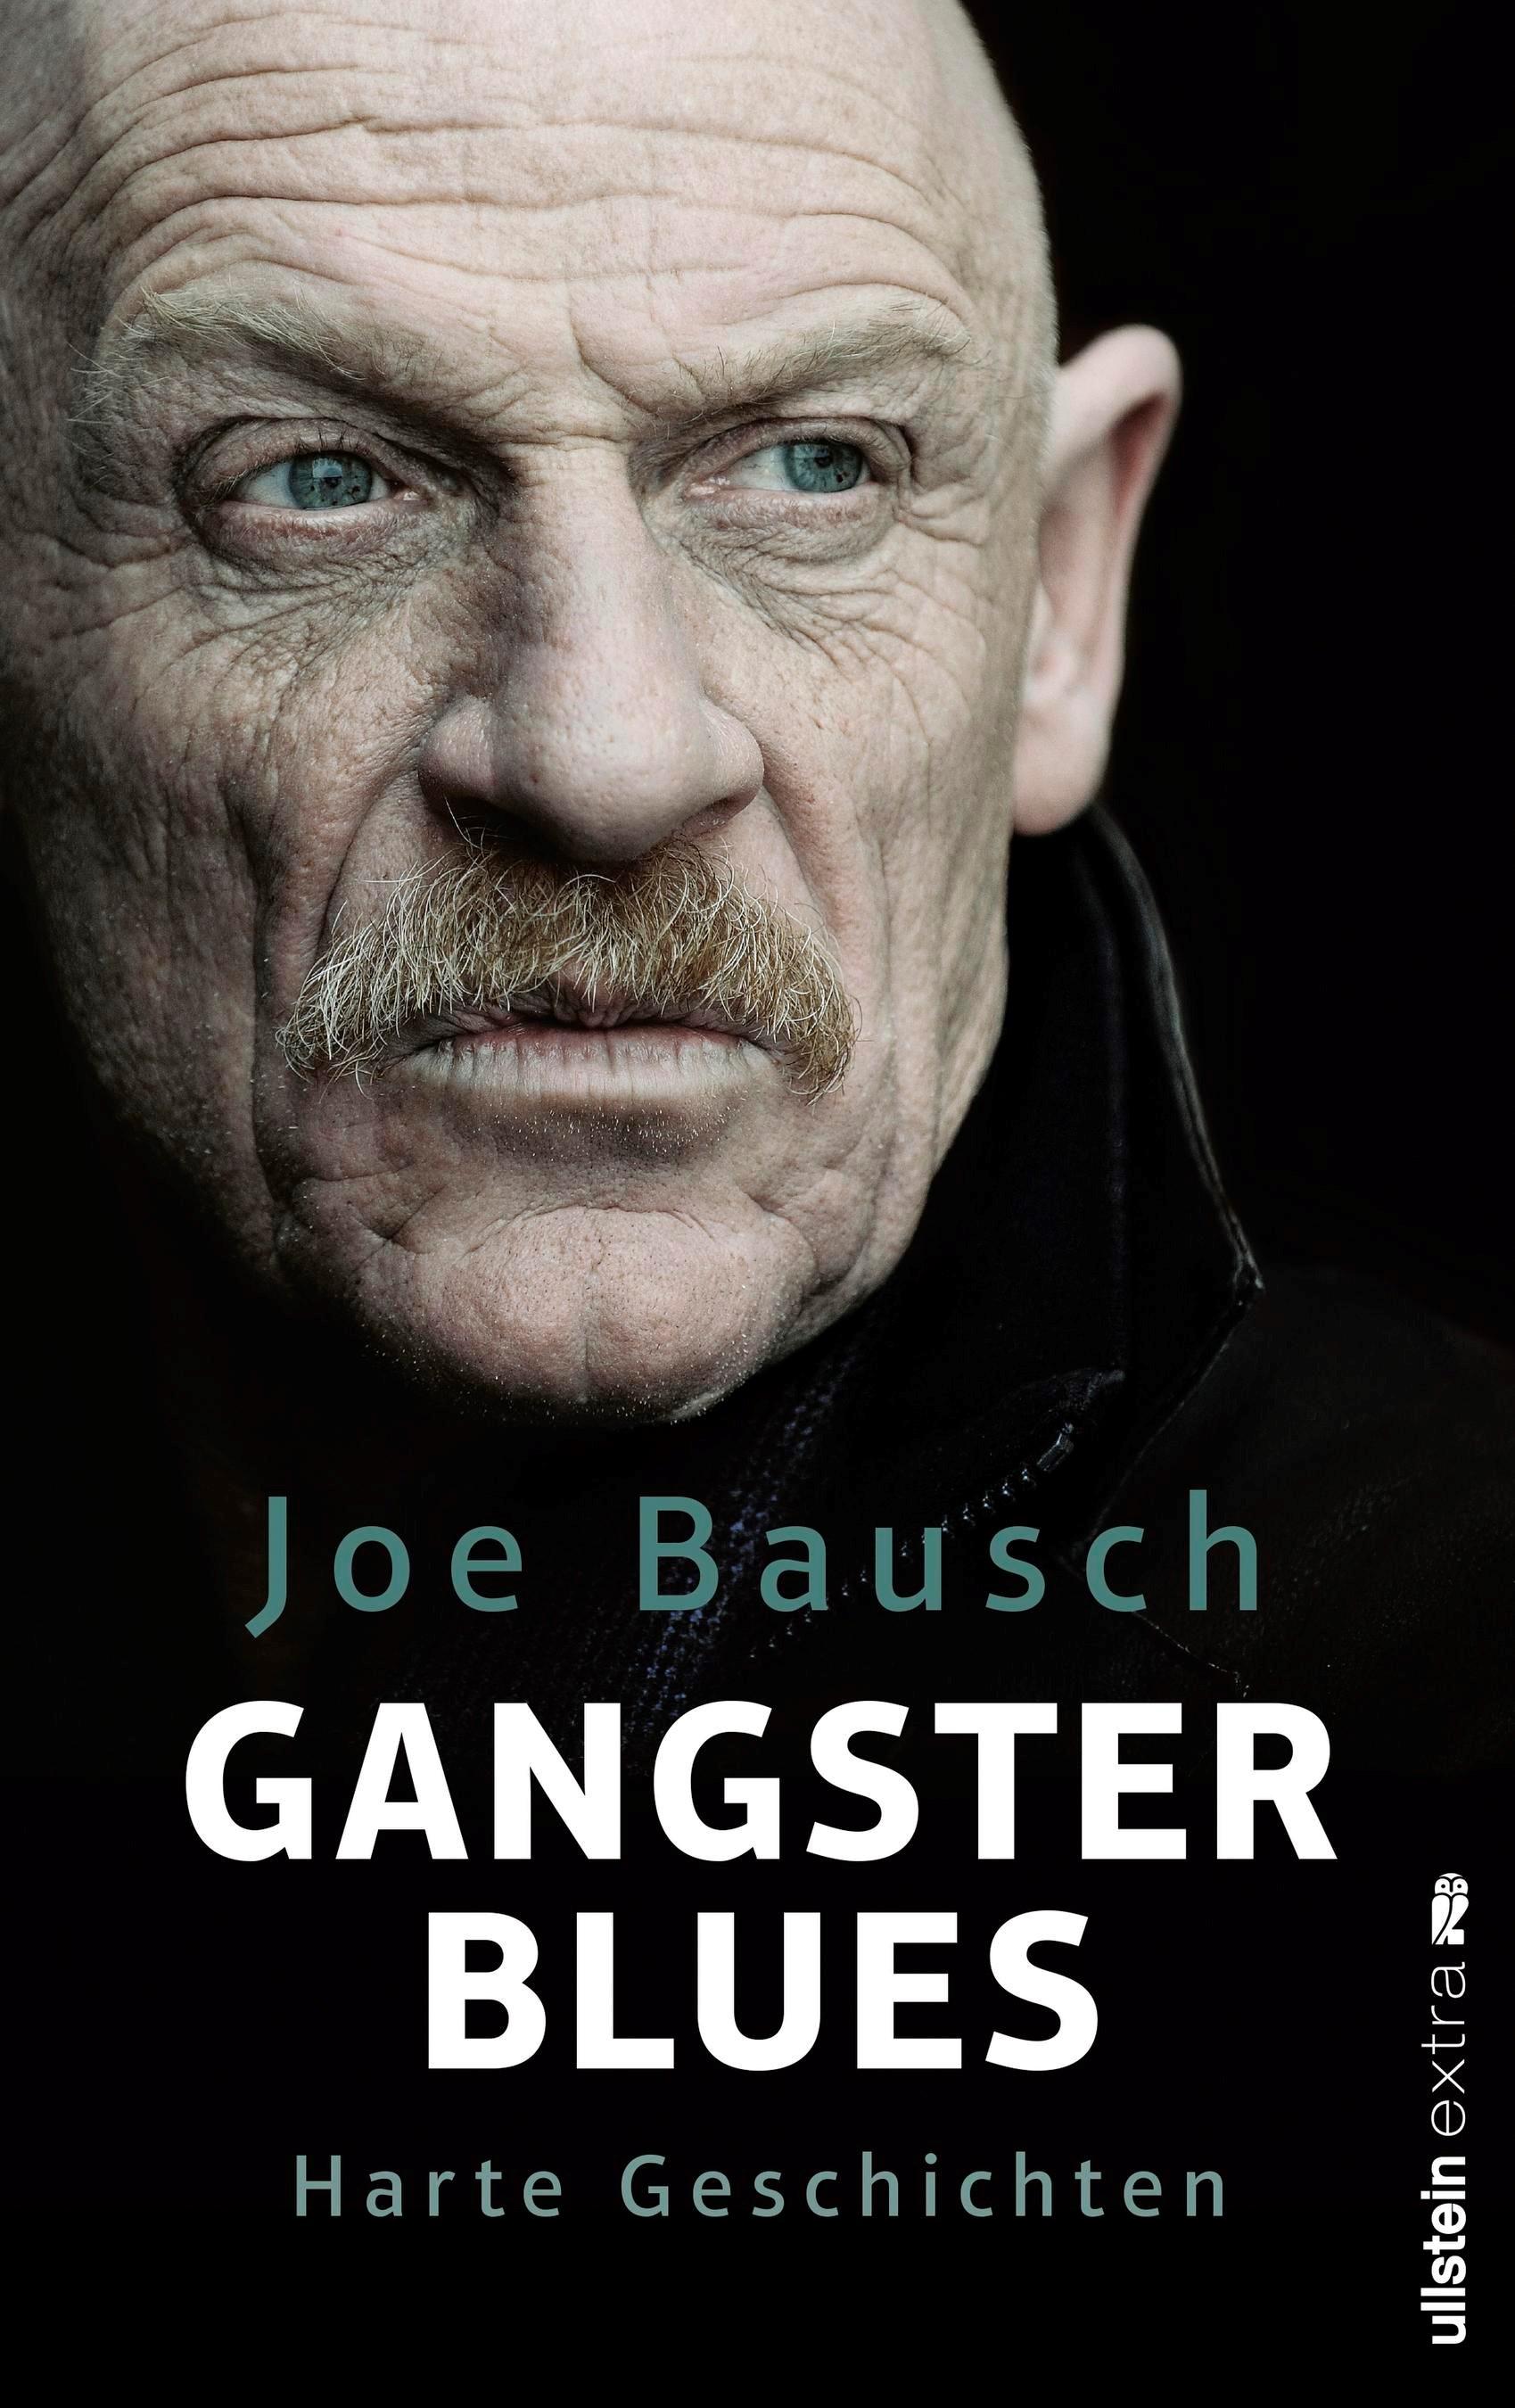 Gangsterblues | Bausch, 2018 | Buch (Cover)